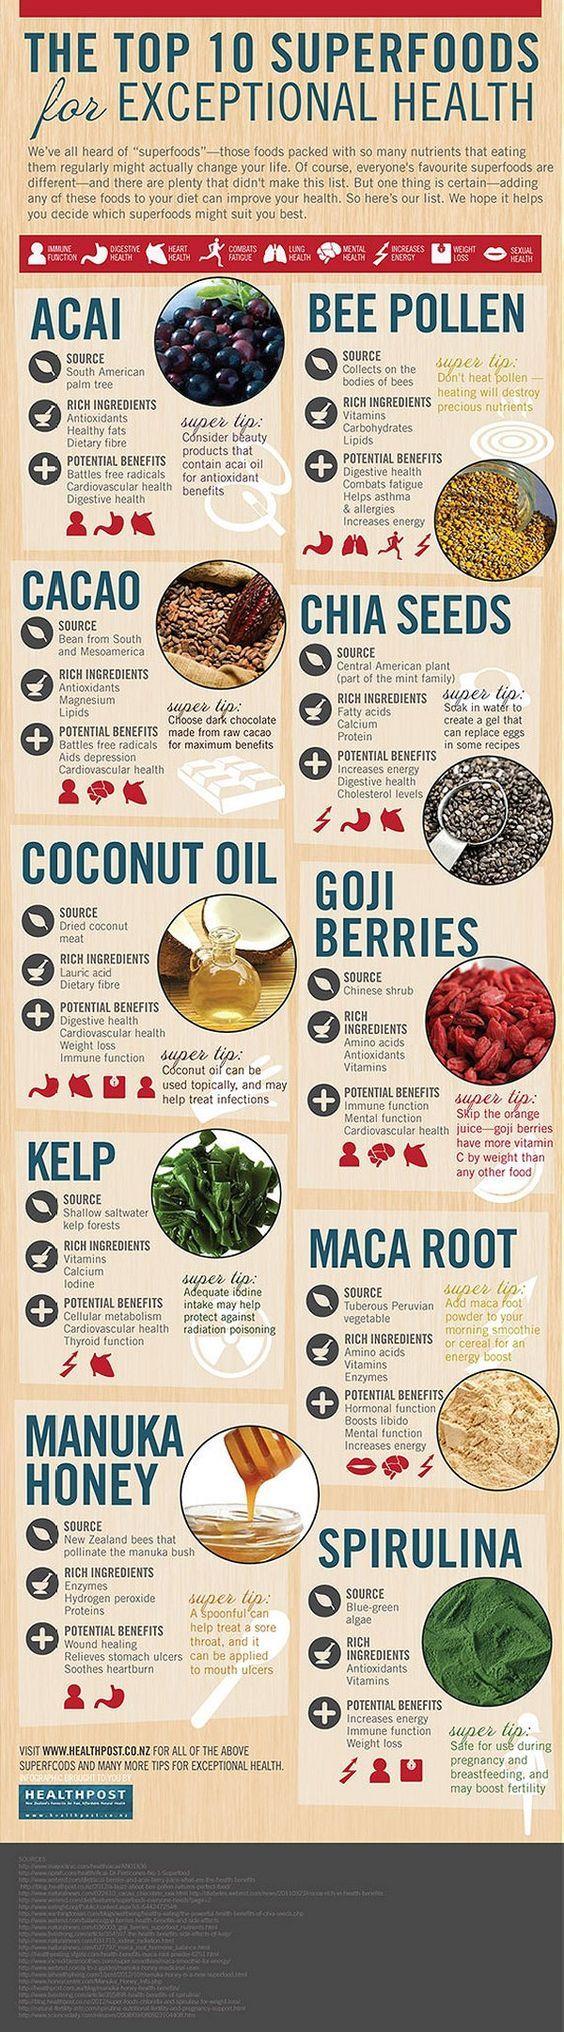 Top 10 Super Foods: coconut oil, Goji Berries, acai, kelp, maca root, bee pollen, chia seeds, spirulina, manuka honey, cacao